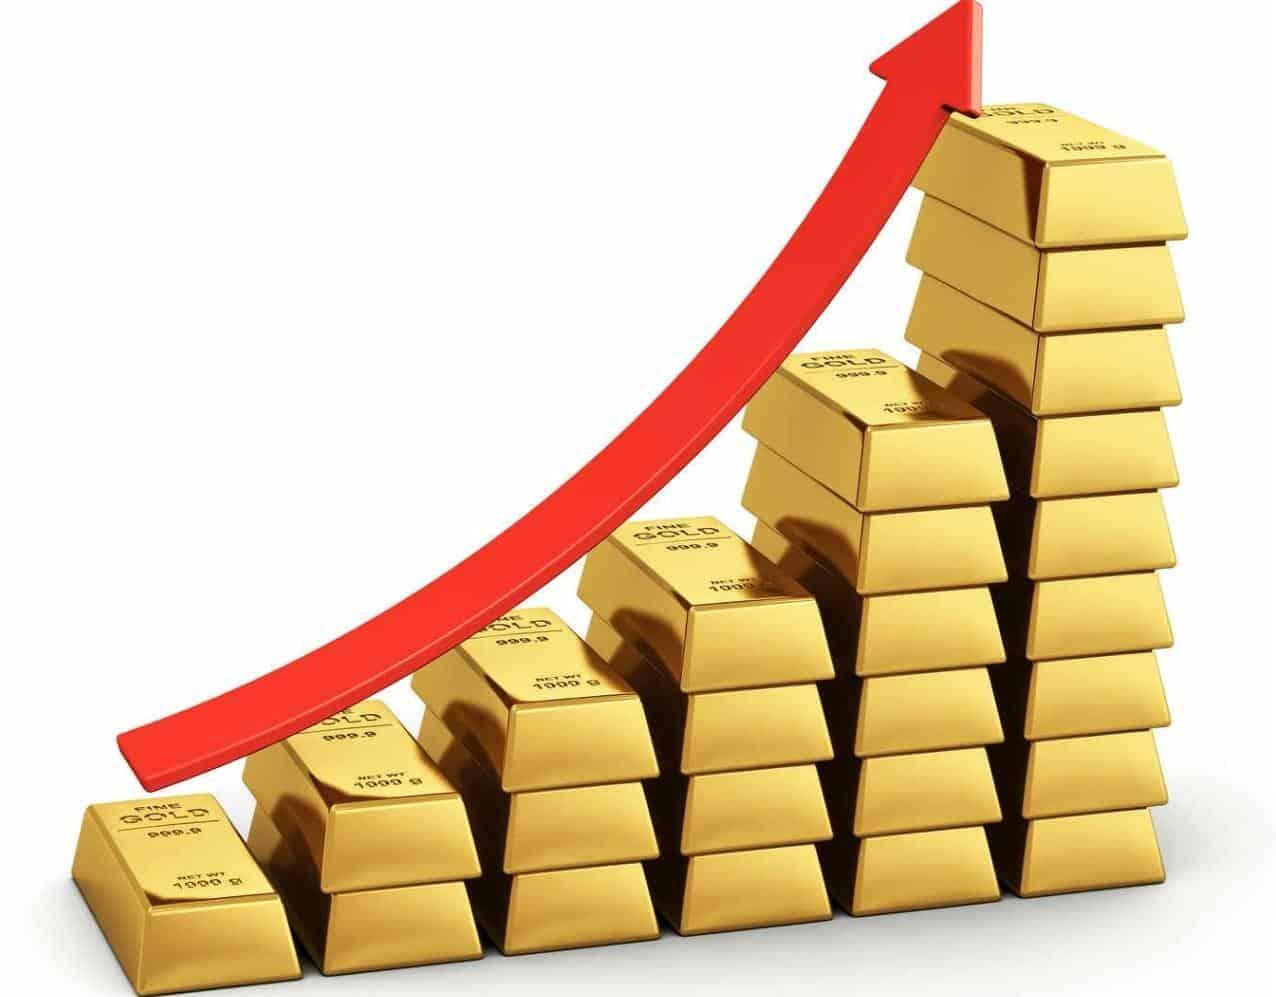 Photo of تقرير بأسعار الذهب فى السعودية من يوم 12 الى 19 سبتمبر 2017مـ